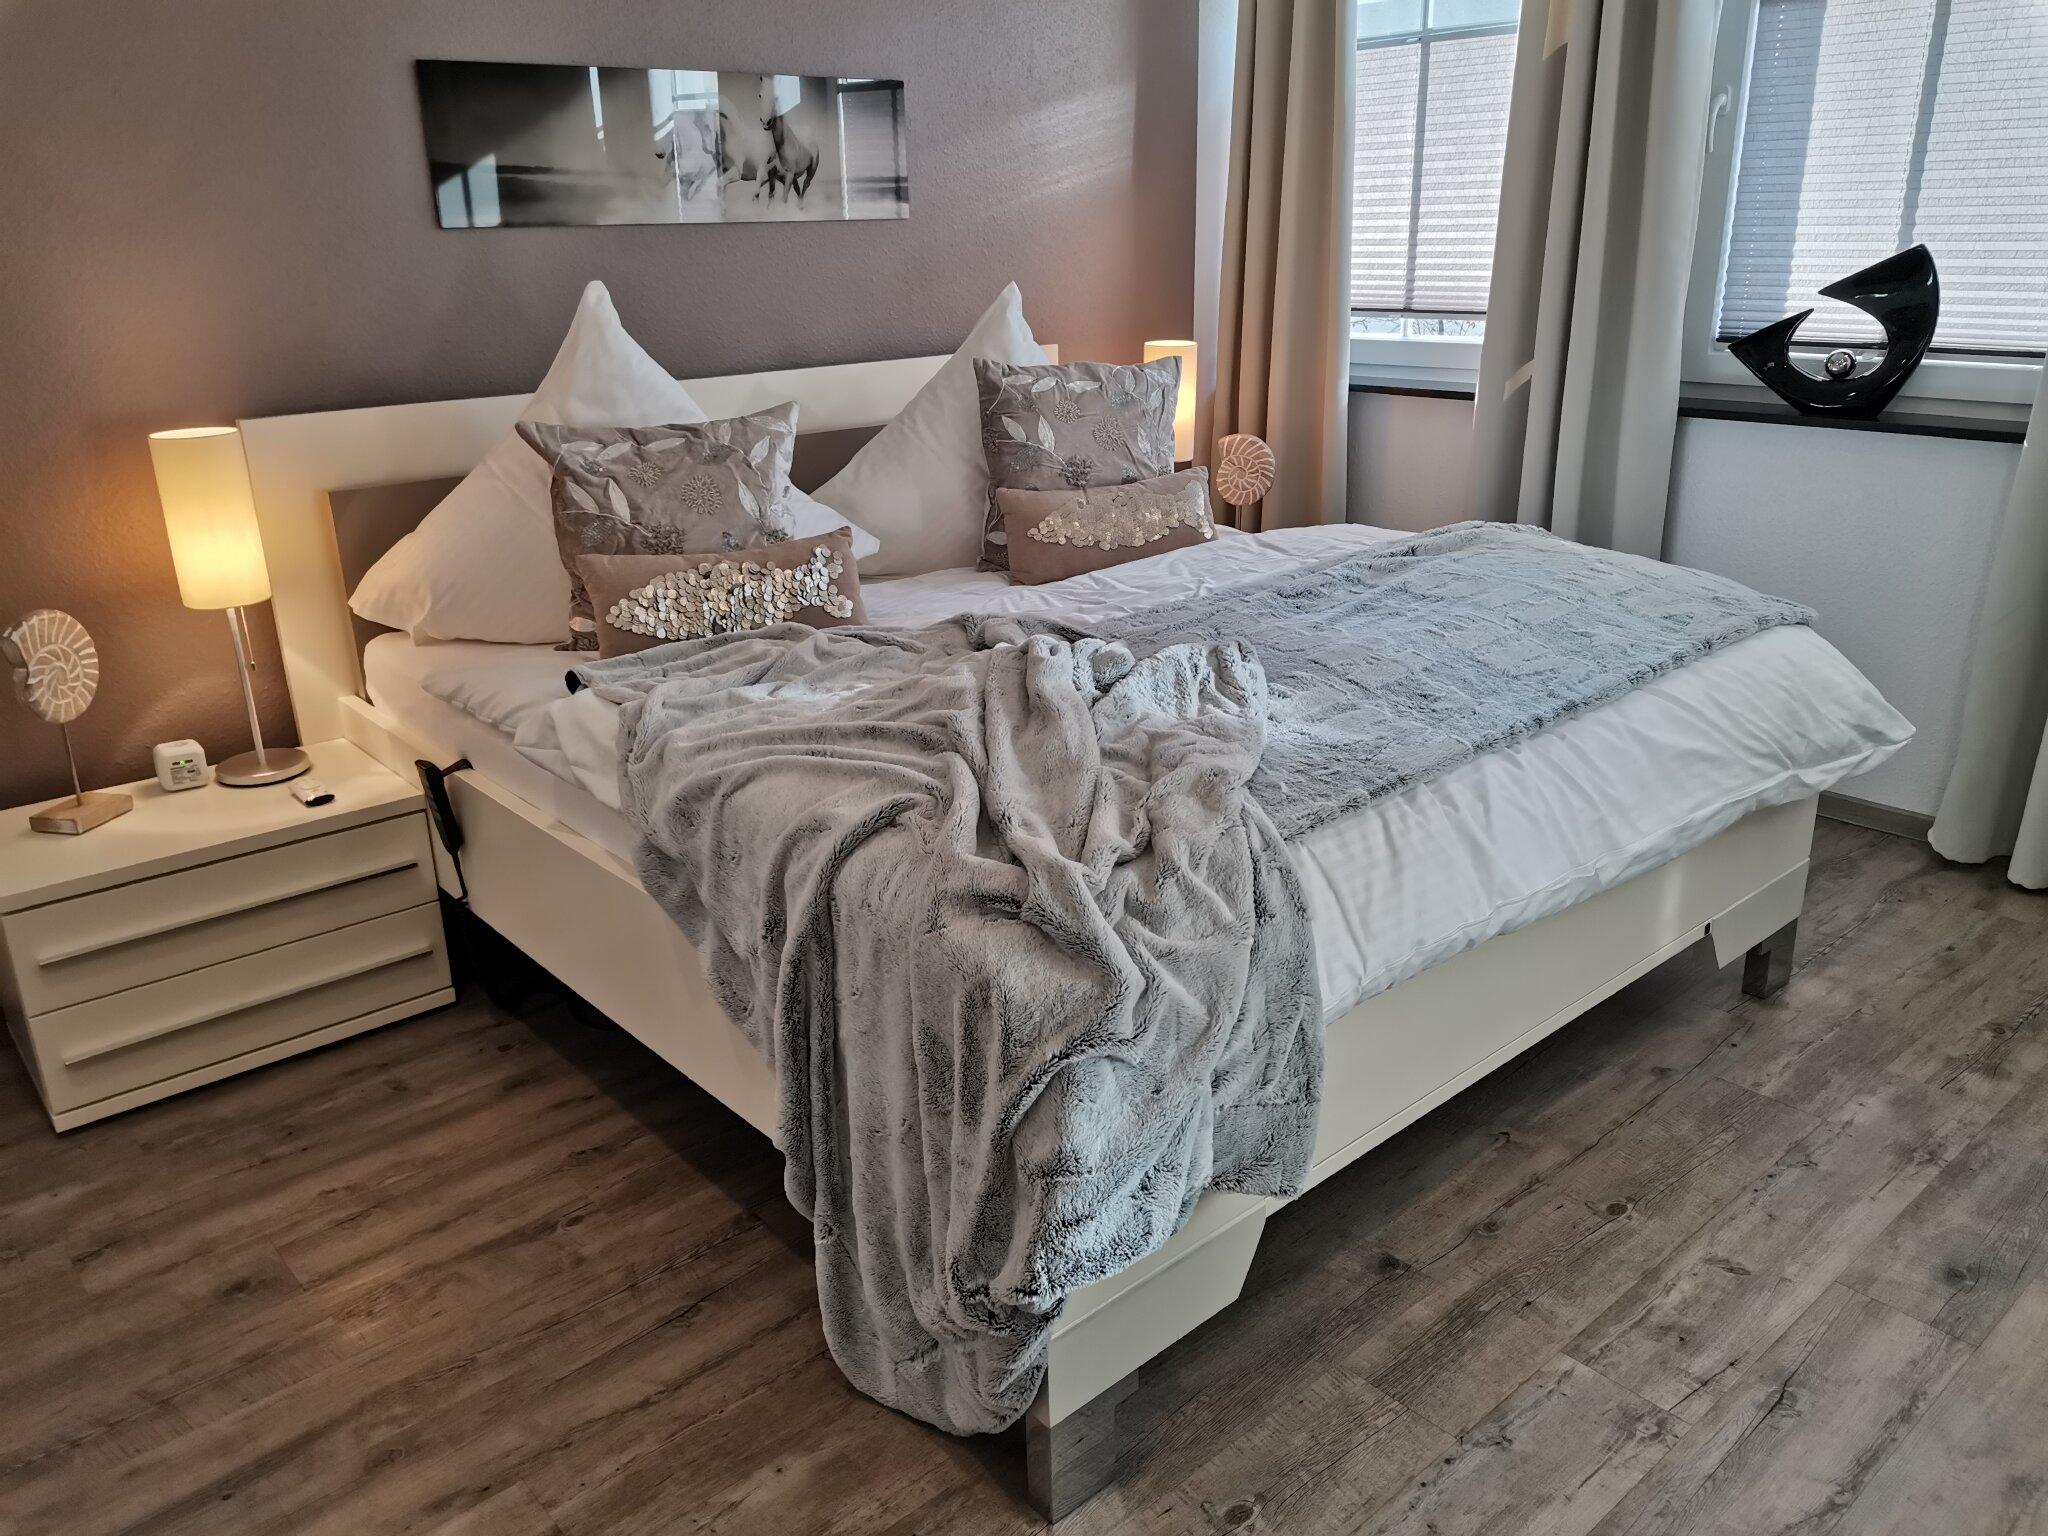 Schlafzimmer 1 mit Seniorenbettsystem,TV